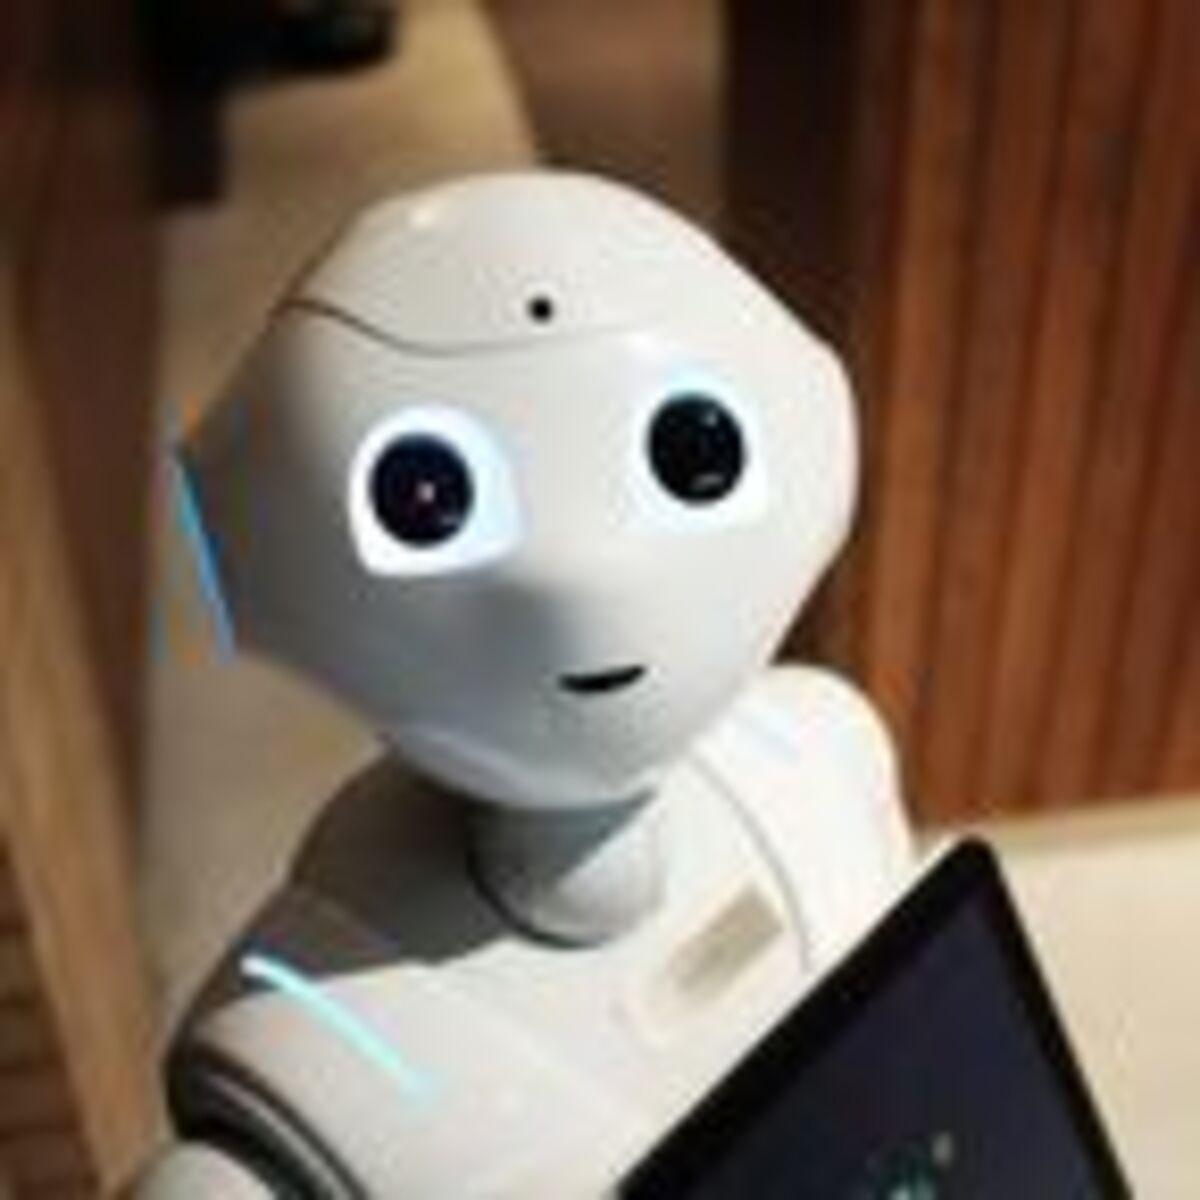 psychologytoday.com - Berit Brogaard D.M.Sci., Ph.D - The Dark Side of Artificial Intelligence